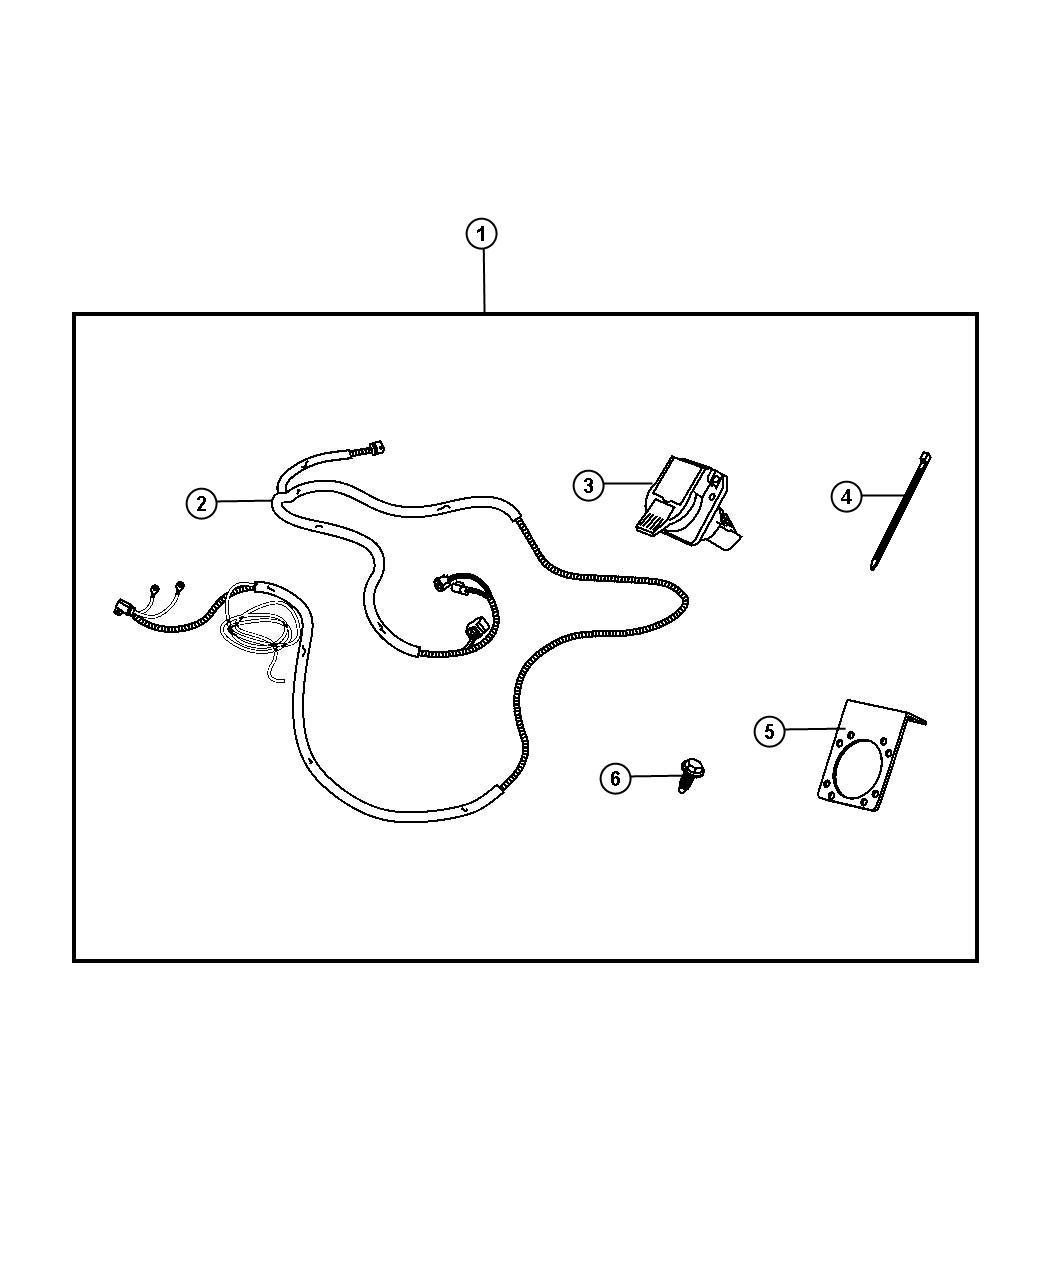 Jeep Wrangler Connector 7 Way